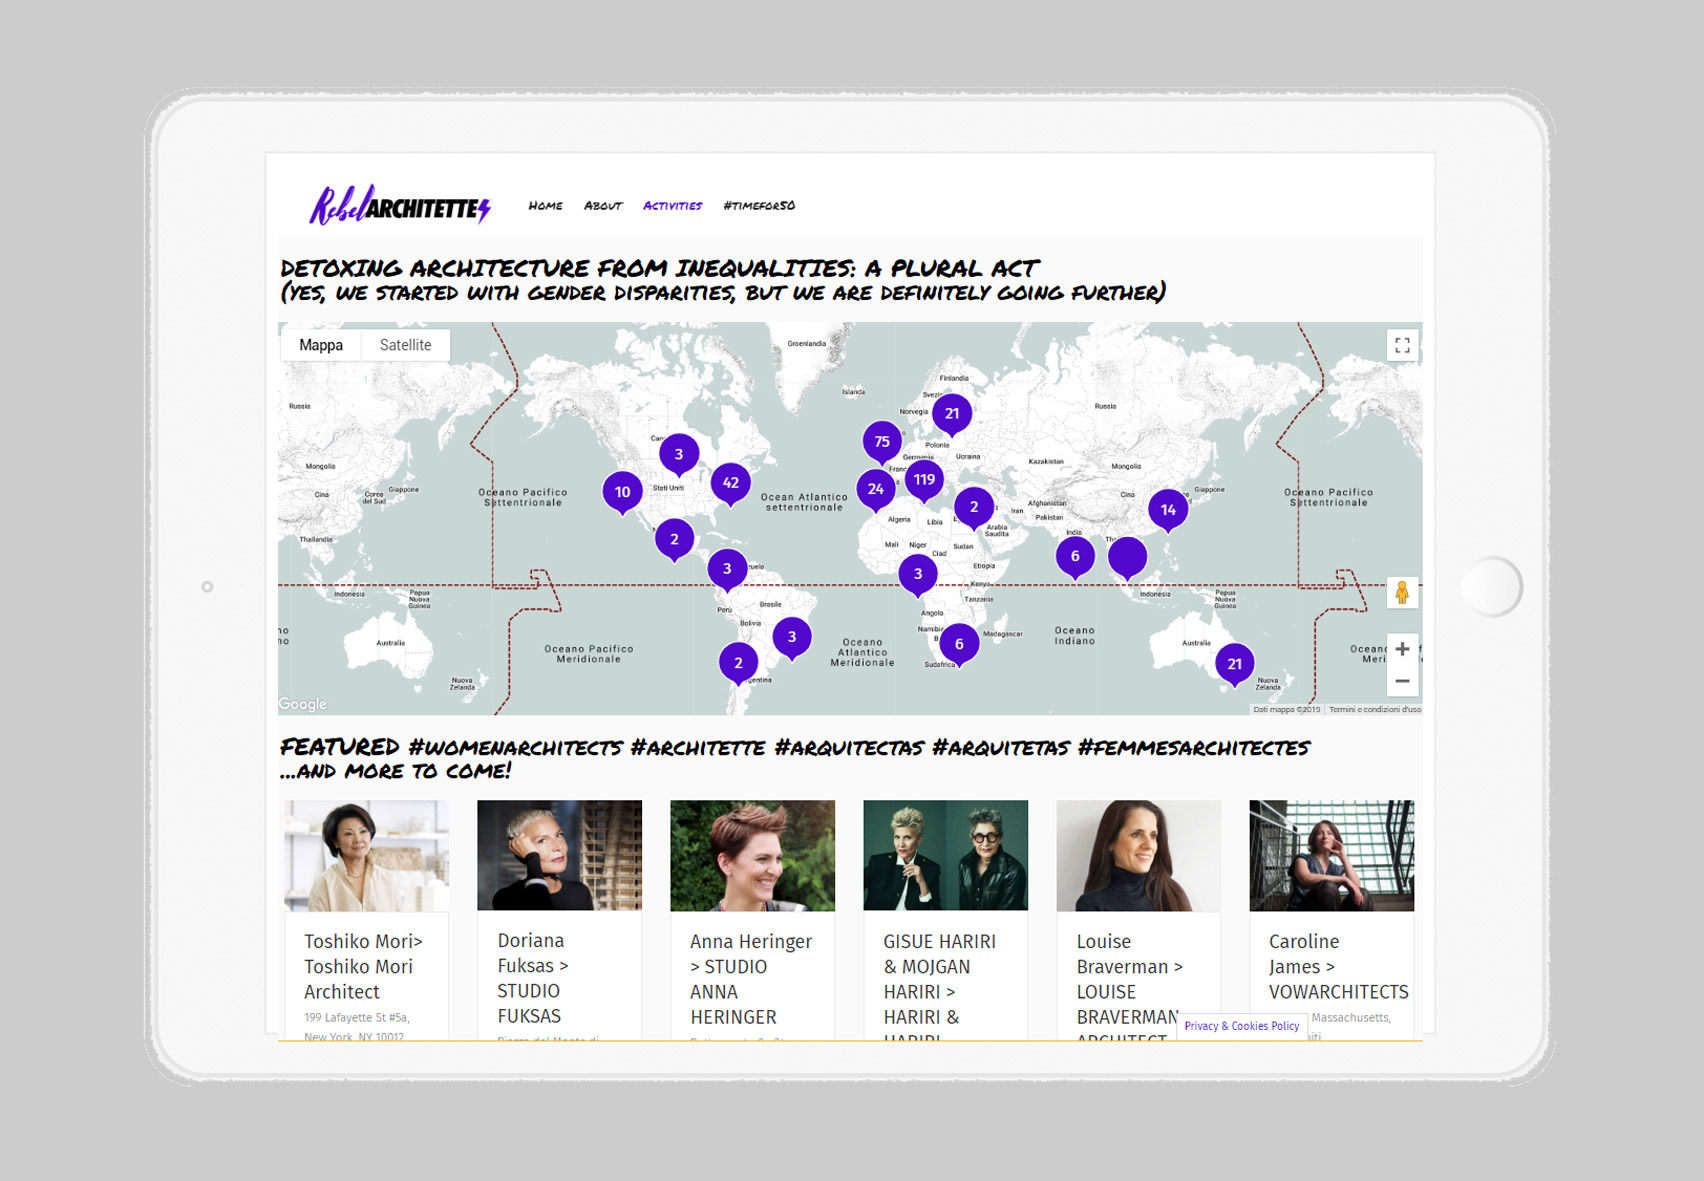 Women Architects World Map by Rebel Architette